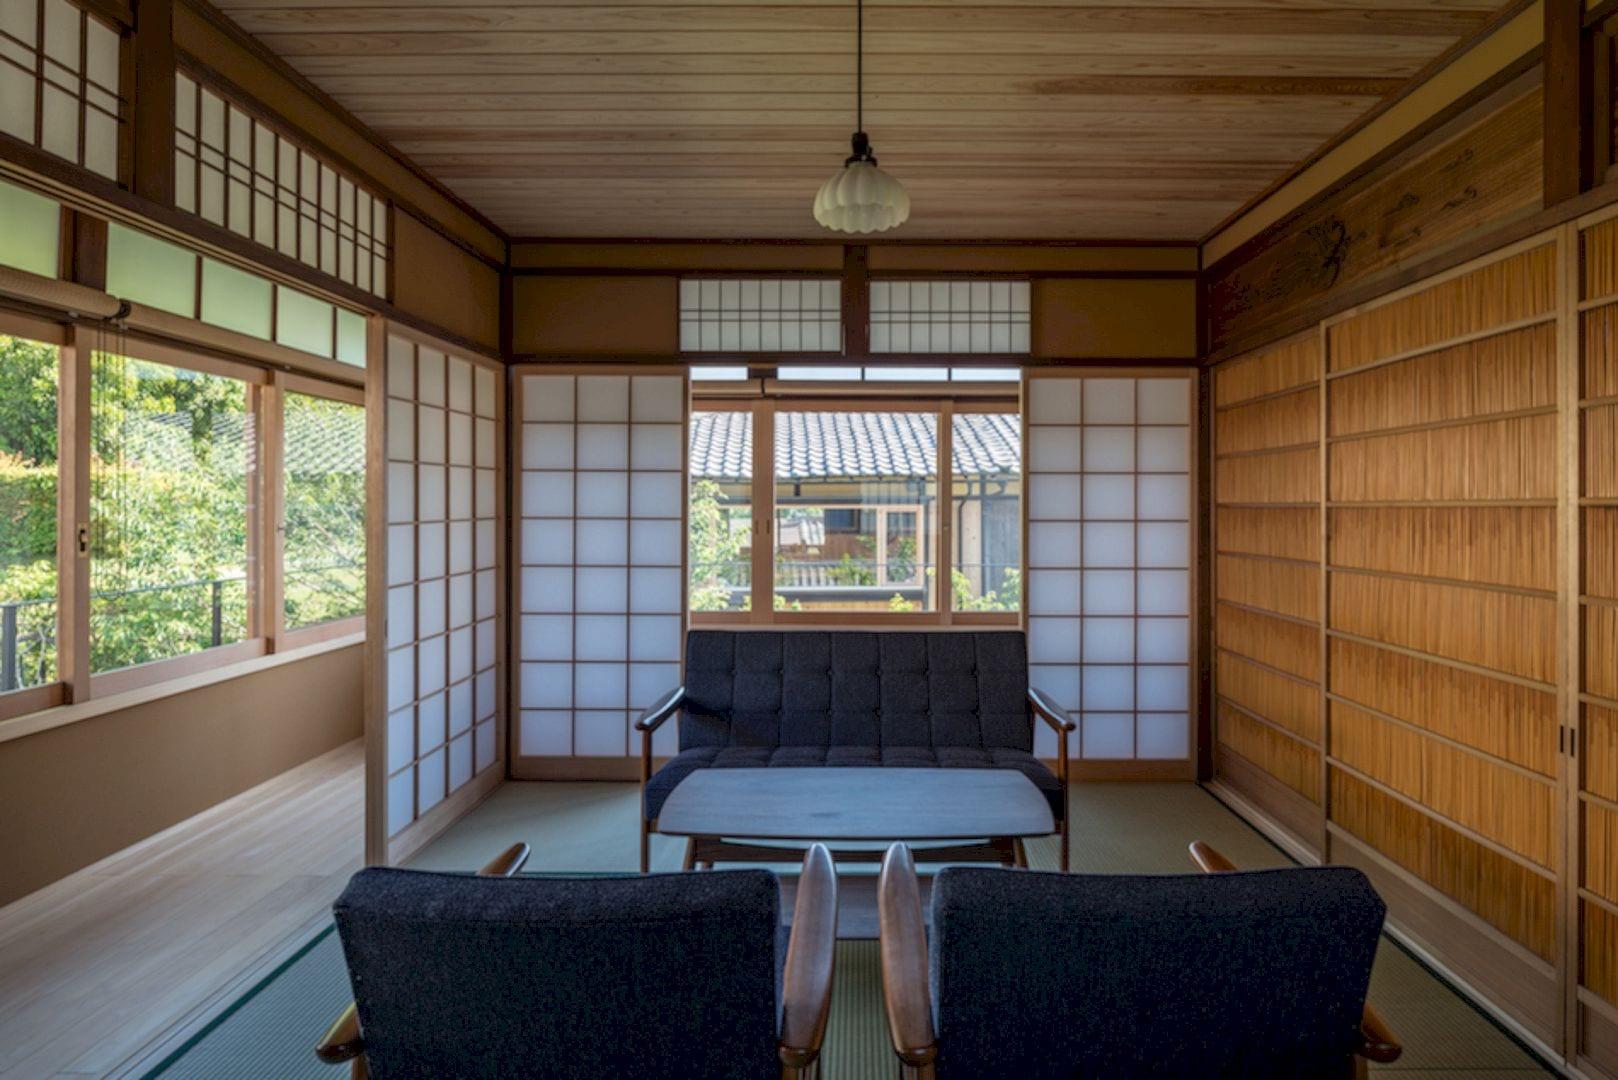 House In Shishigatani By Kazuya Morita Architecture Studio 7